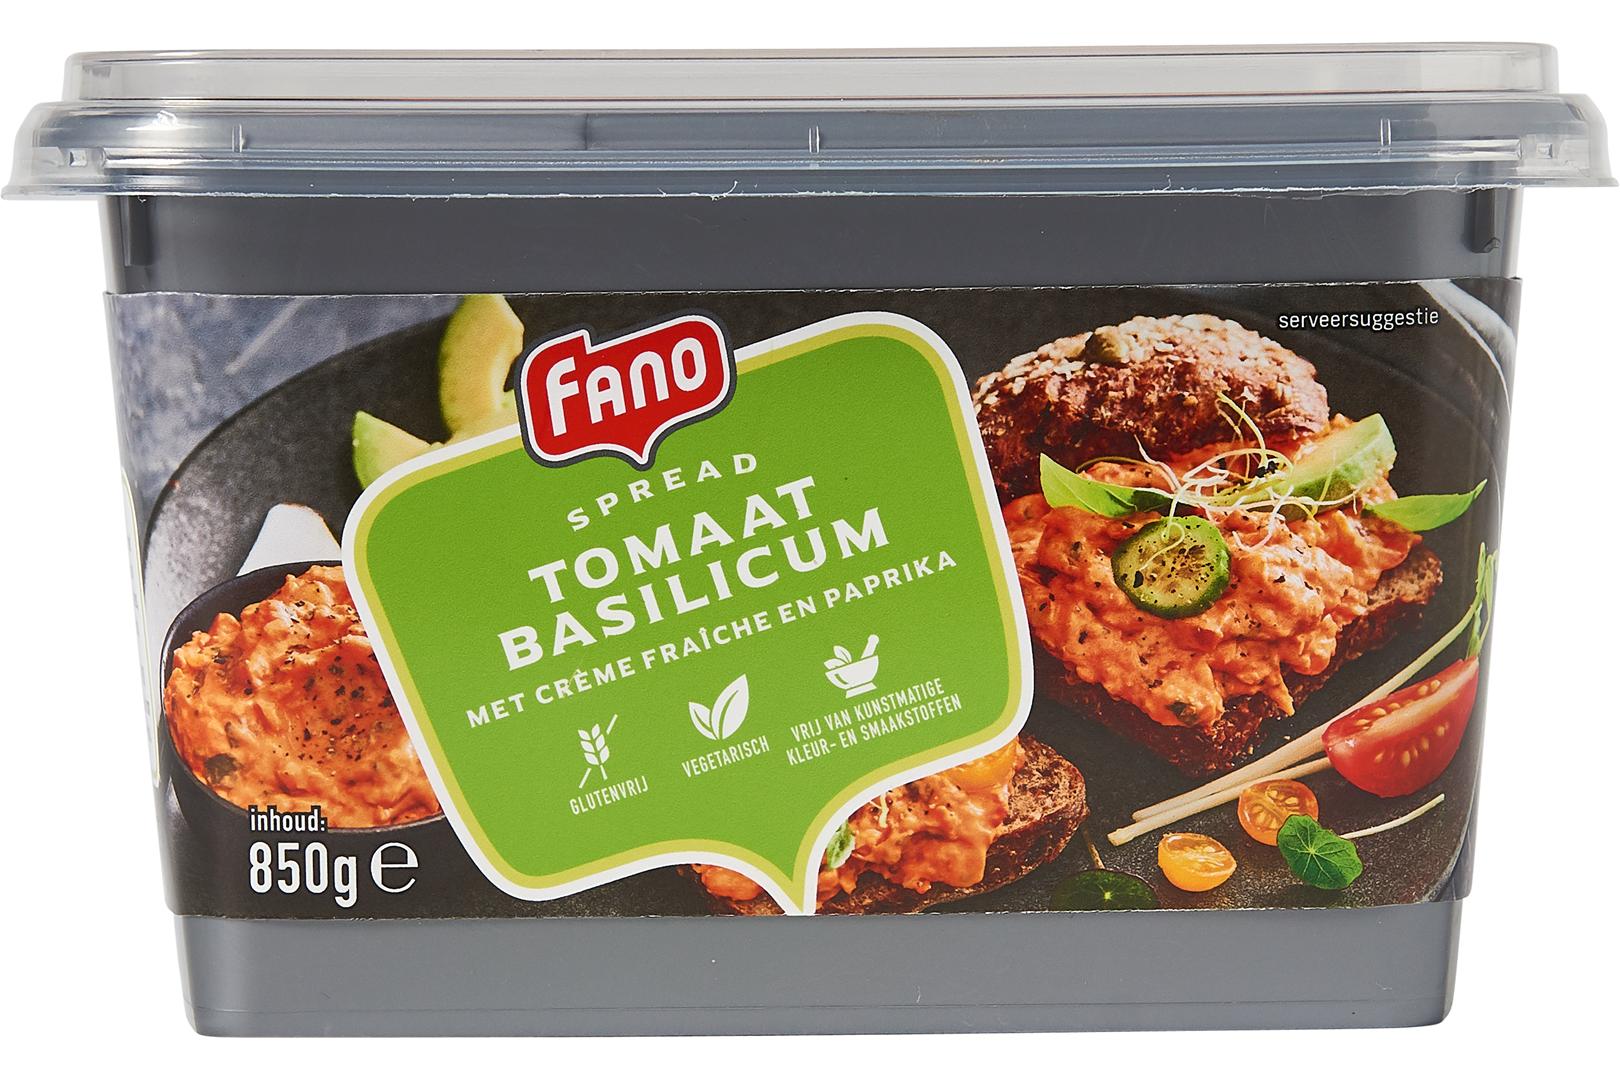 Productafbeelding FANO Tomaat basilicum spread 850g